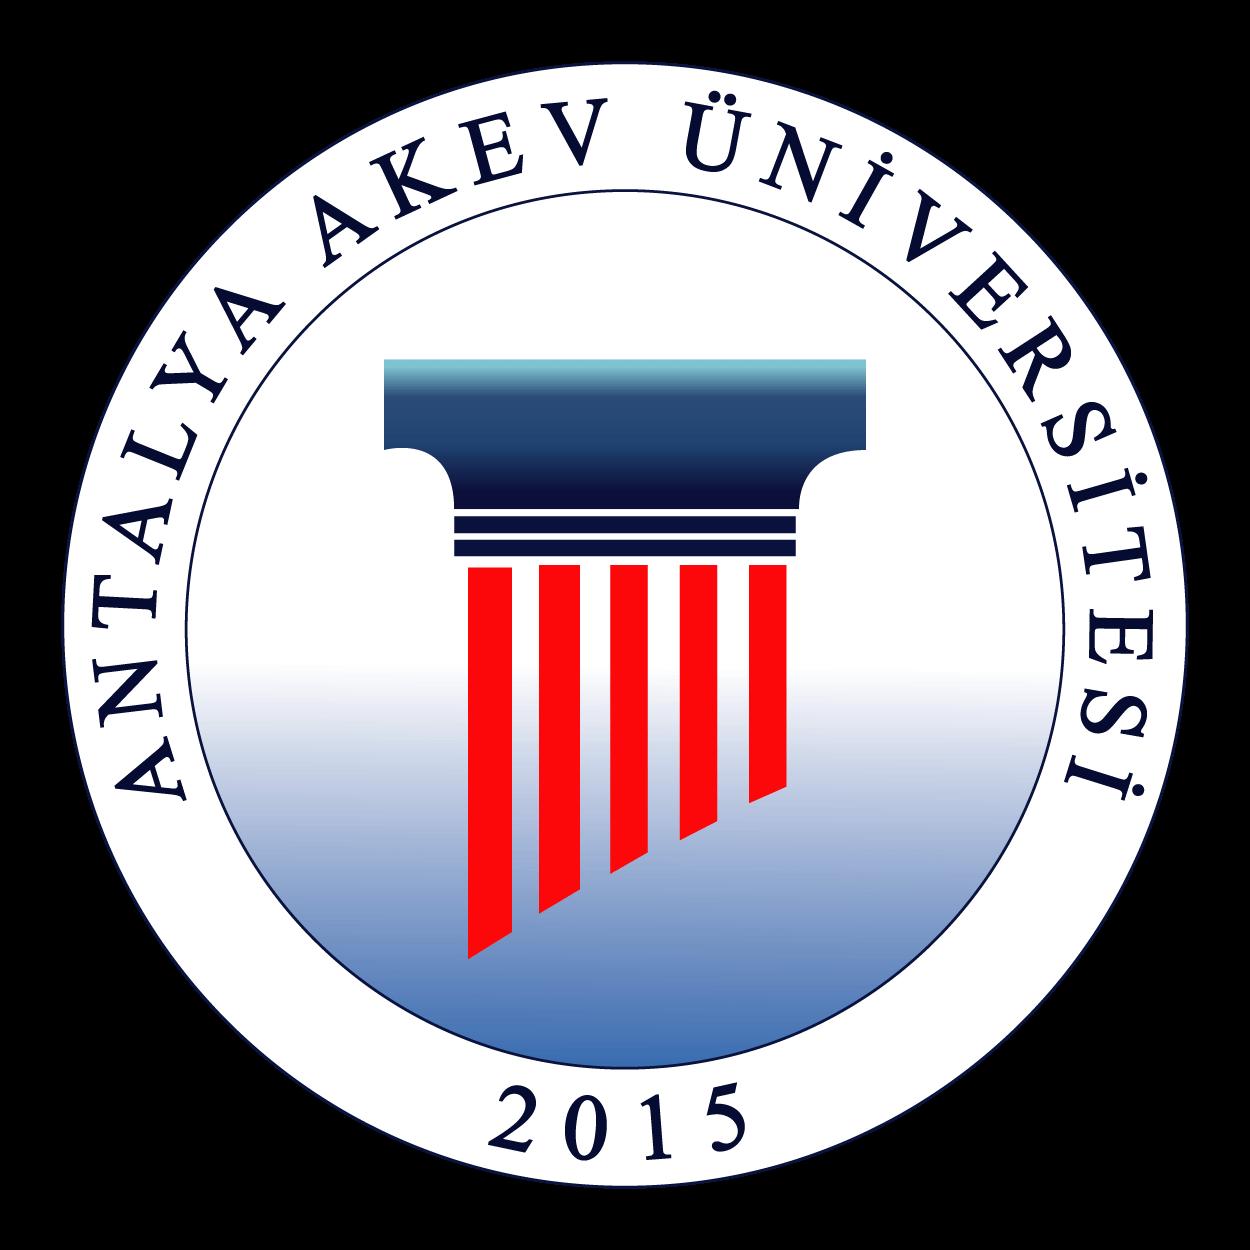 Antalya AKEV Üniversitesi Logo png